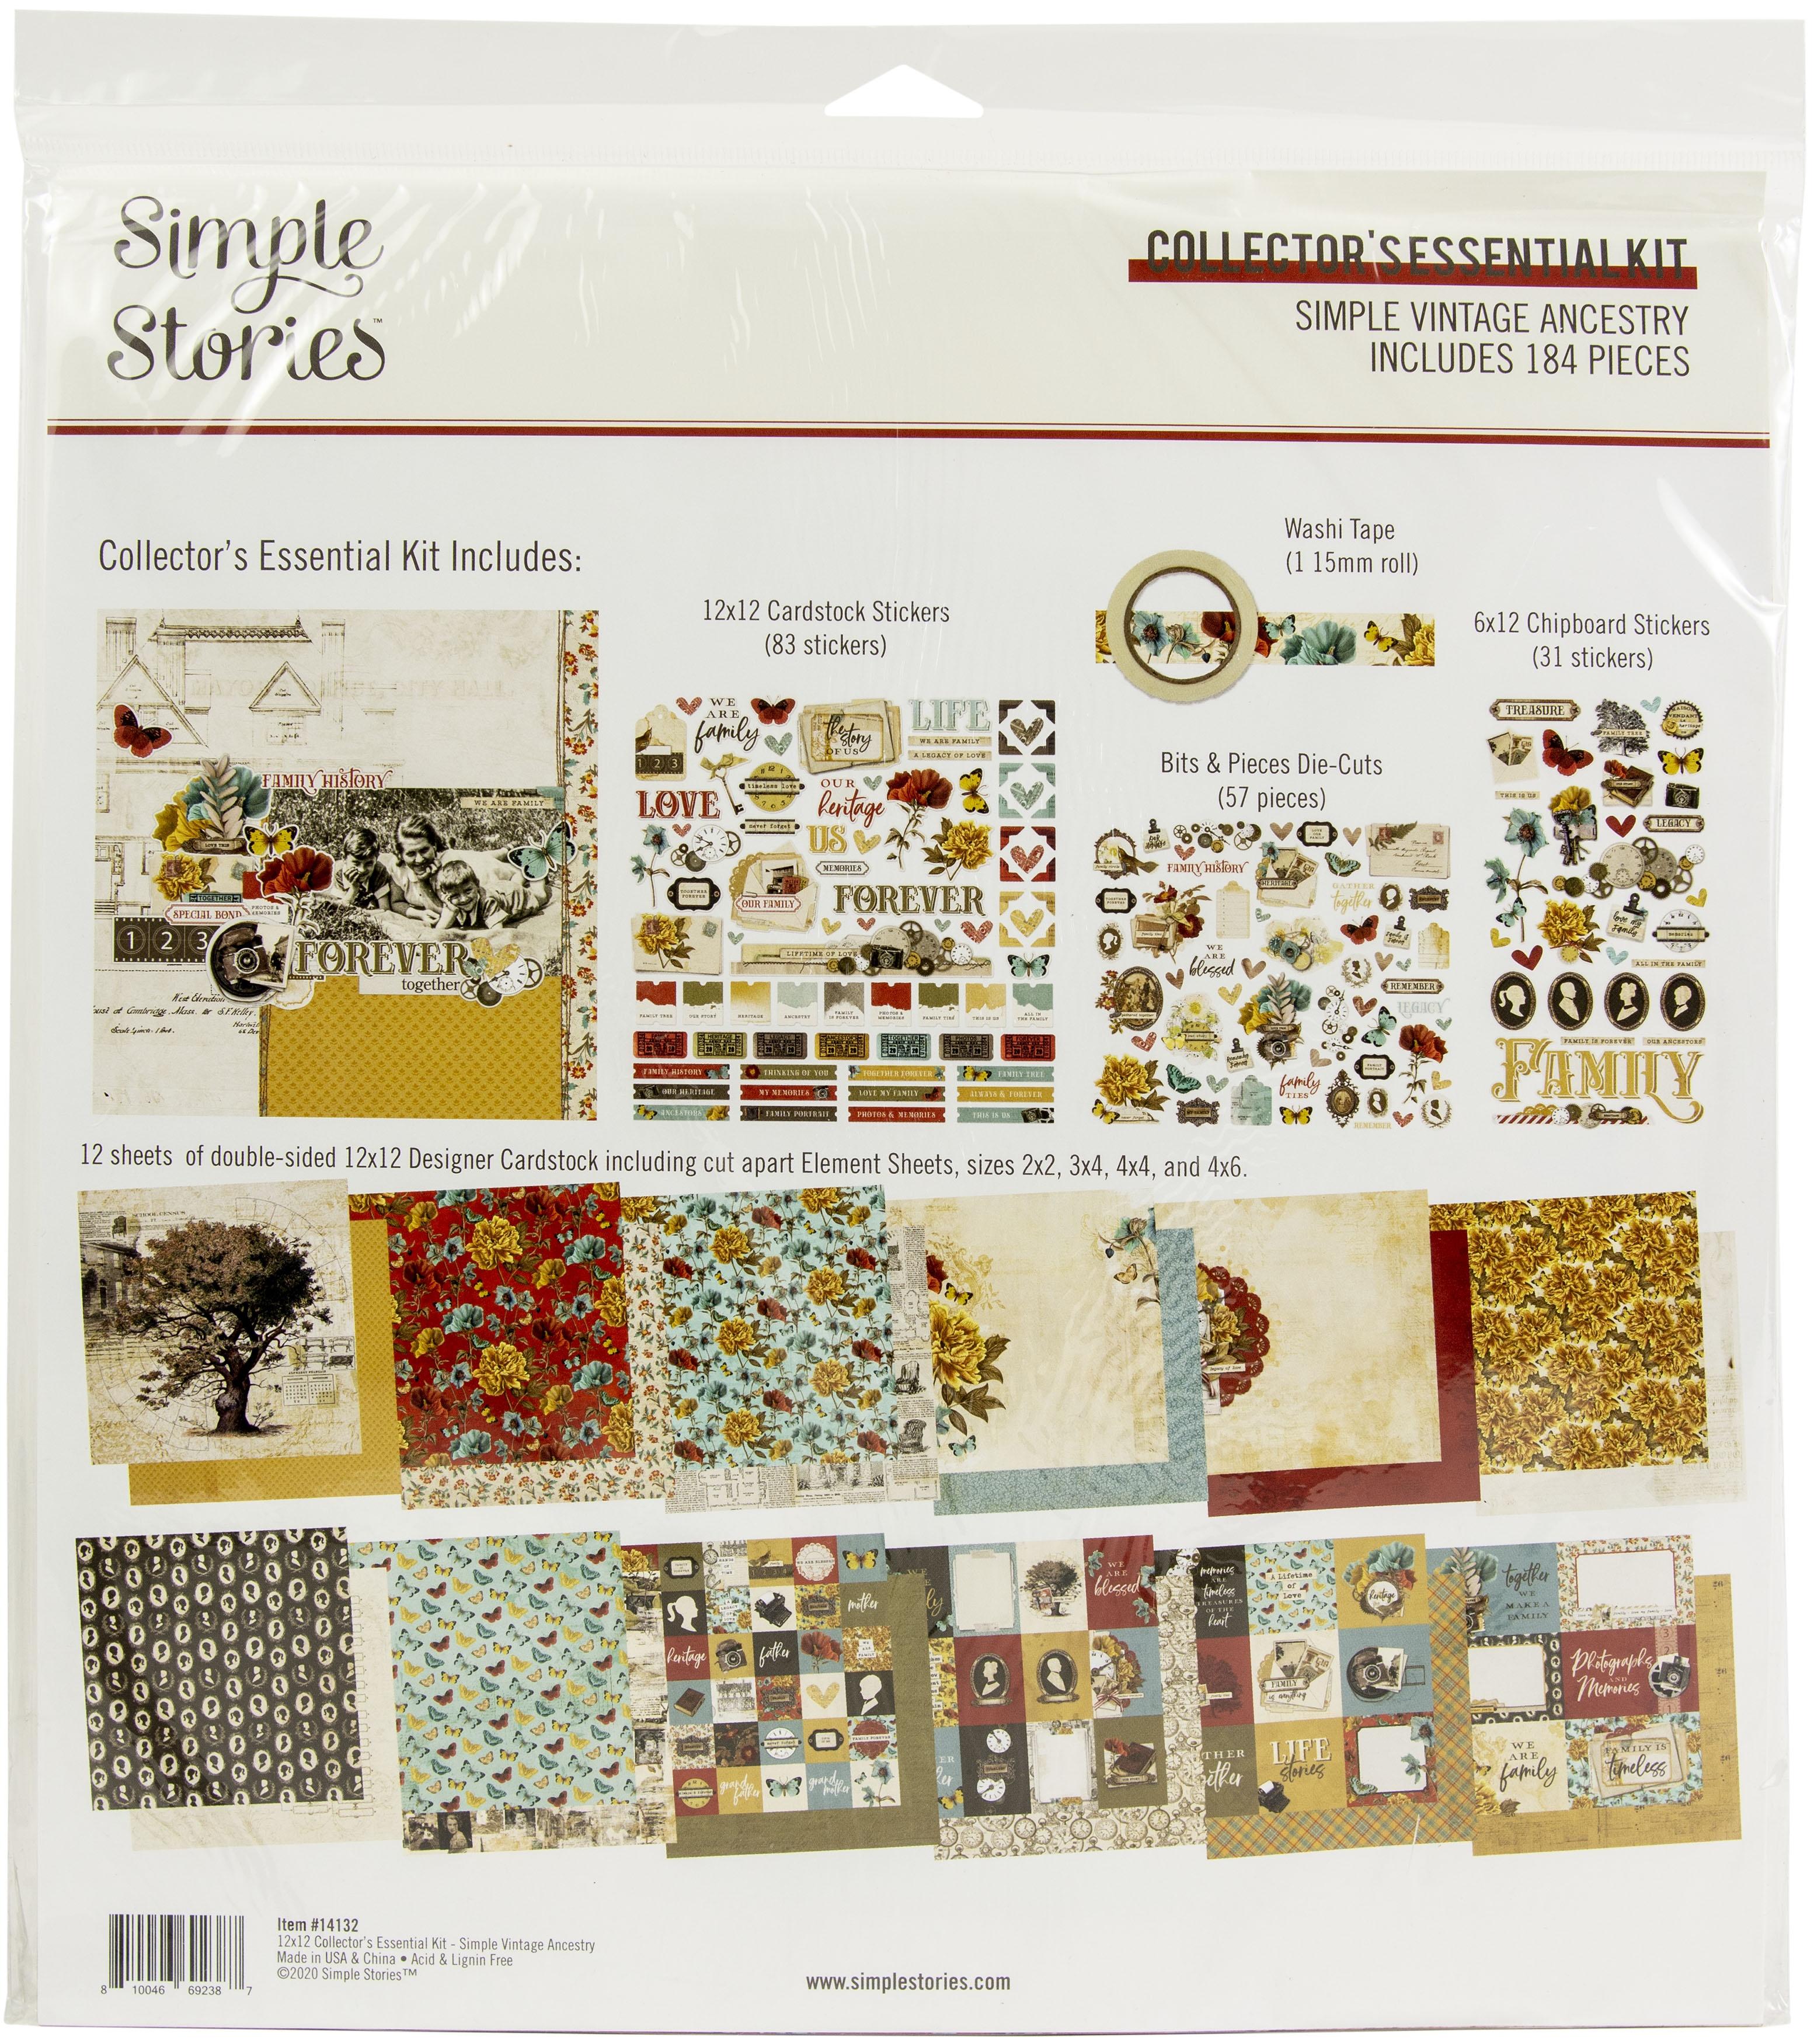 Simple Stories Collector's Essential Kit 12X12 - Simple Vintage Ancestry